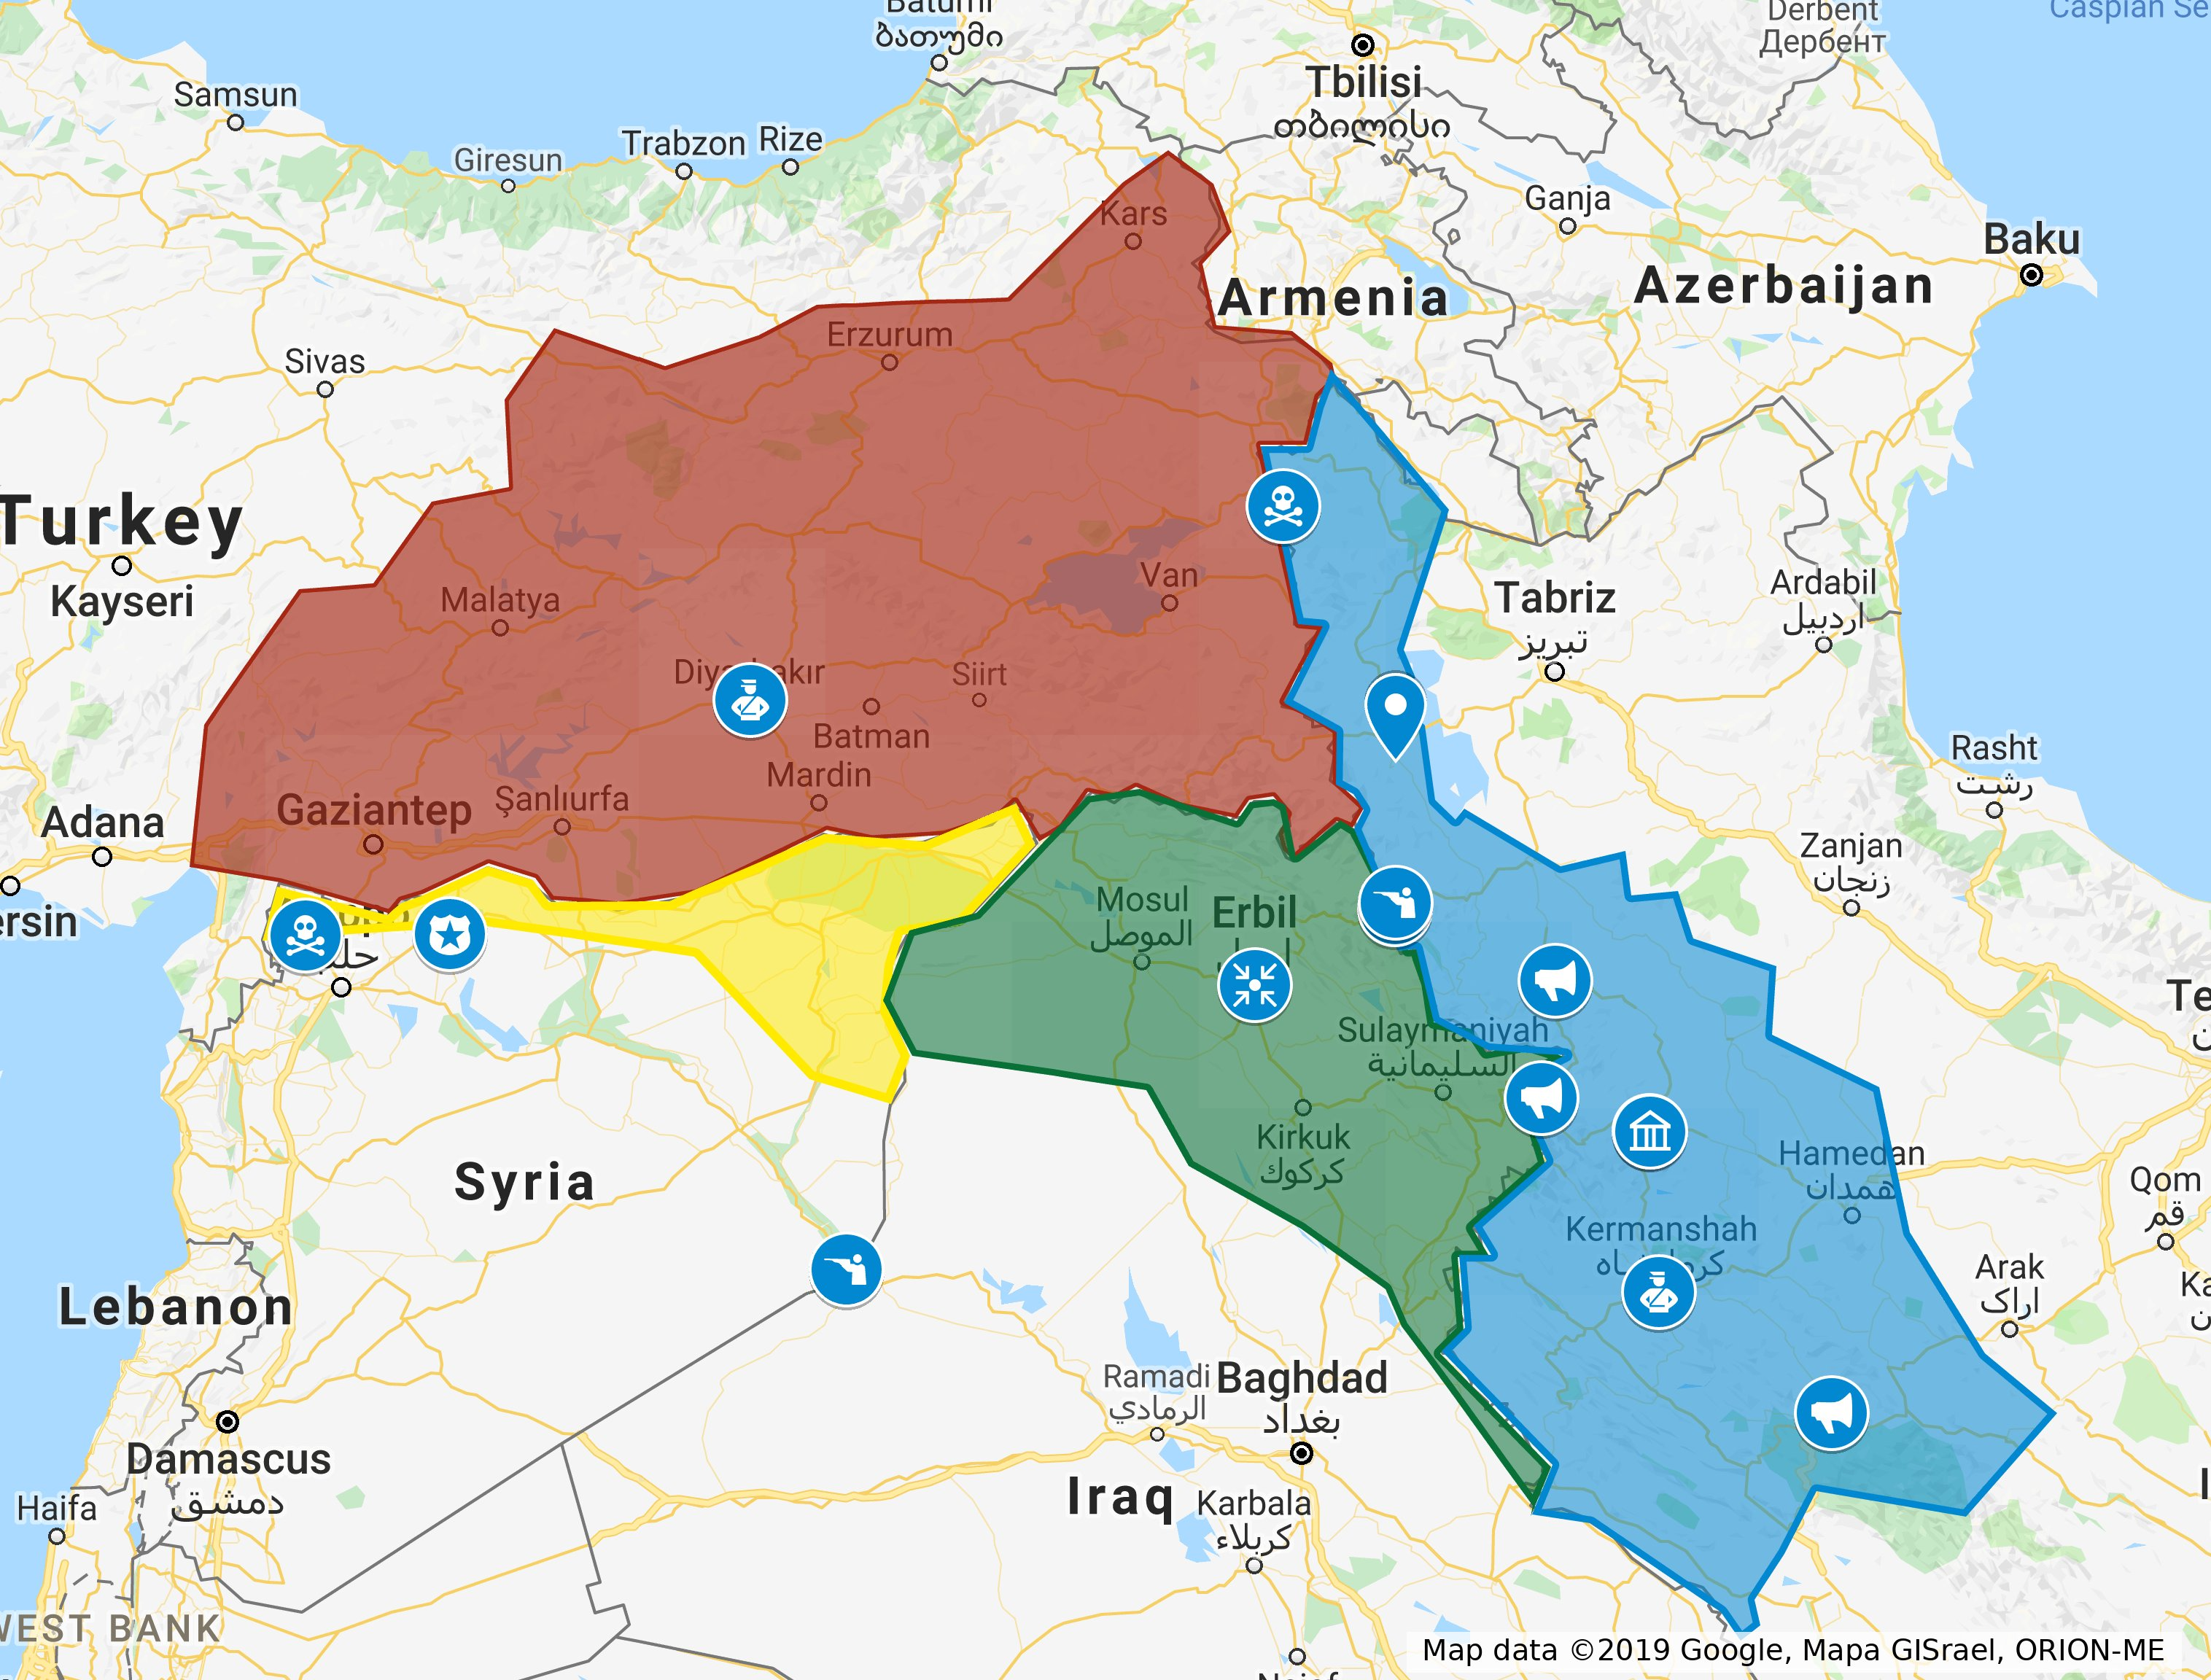 Kurdistan's Weekly Brief March 5, 2019 | Washington Kurdish Insute on dead sea map, chechnya map, kashmir map, erbil map, kyrgyzstan map, baluchistan map, lebanon map, iraqi kurdistan, uzbekistan map, assyria map, kurdish population map, kurdish language, ukraine map, kurdish jews, turkish kurdistan, iraq map, afghanistan map, iranian kurdistan, halabja poison gas attack, kurdistan province, kurdish people, turkey map, kuwait map, baghdad map, kurdish flag, south ossetia map, palestine map, zagros mountains, persian people, iran map, scotland map,